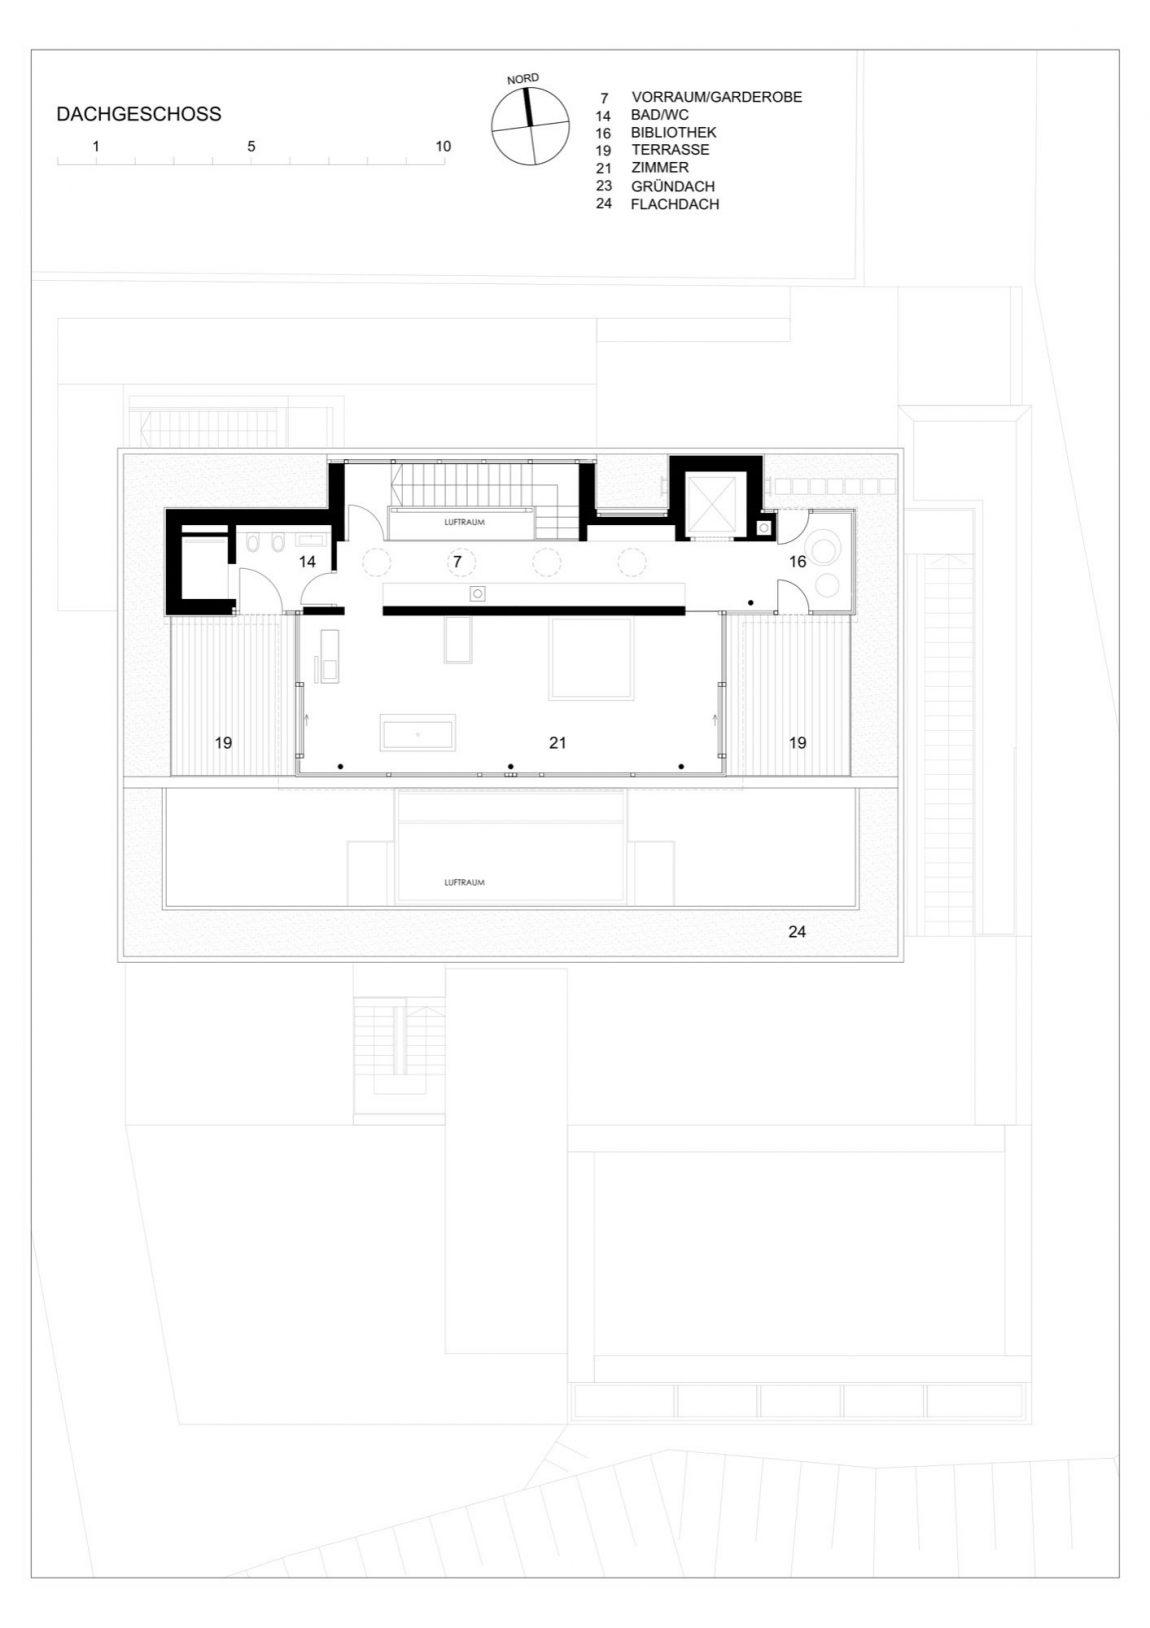 Second level floor plan of POHO33